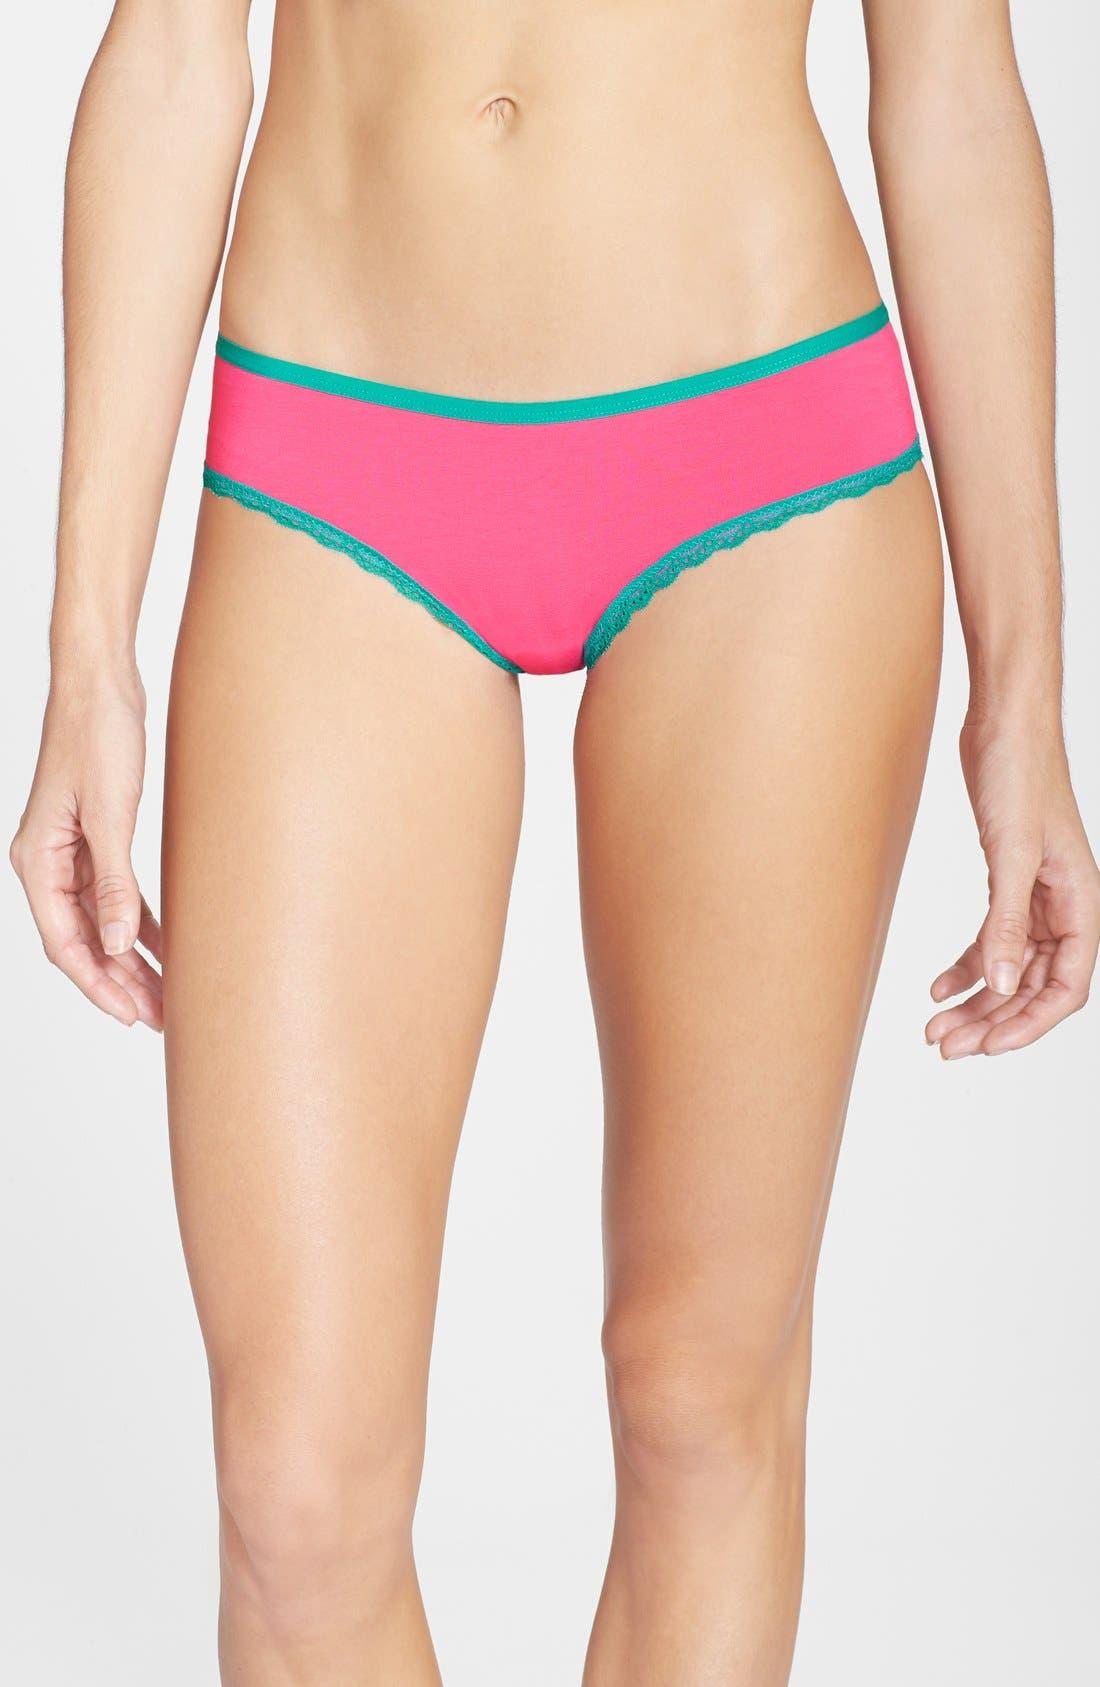 Alternate Image 1 Selected - h.dew 'Tessa' Cotton Bikini